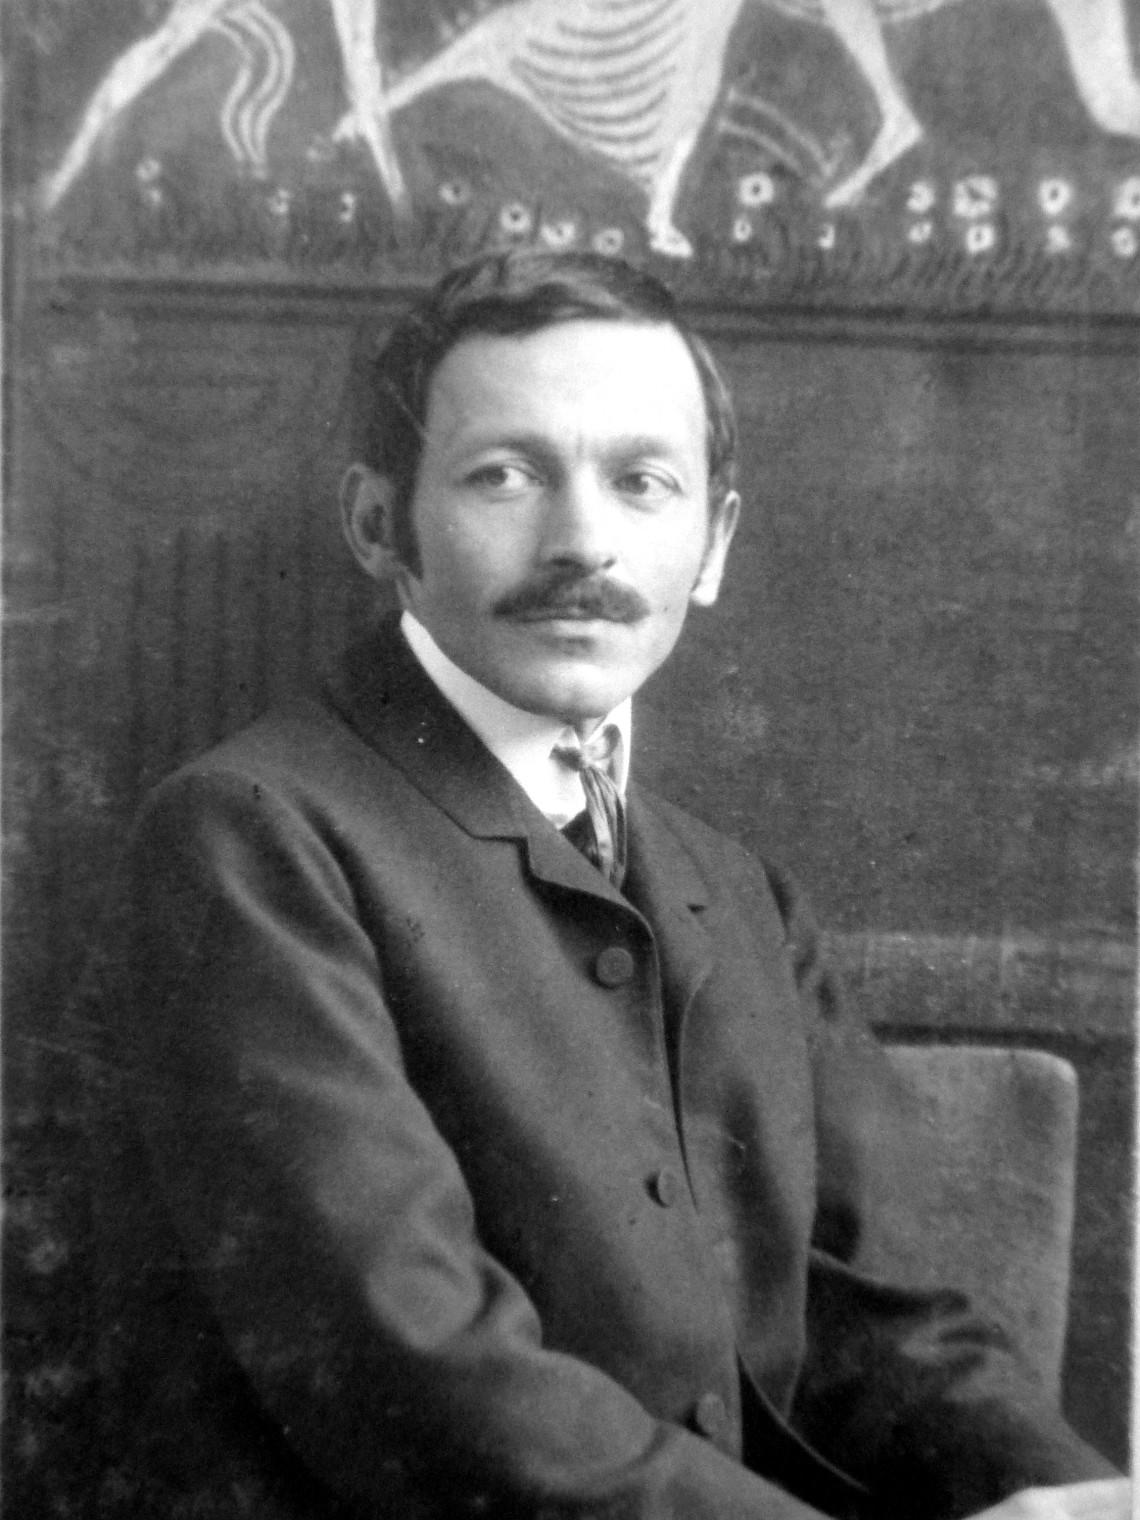 Portret Ignatius Taschner, circa 1900. Foto uit familiebezit. Foto met dank aan Wikimedia Commons, Ignaz Fischer-Kerli, CC BY-SA 4.0